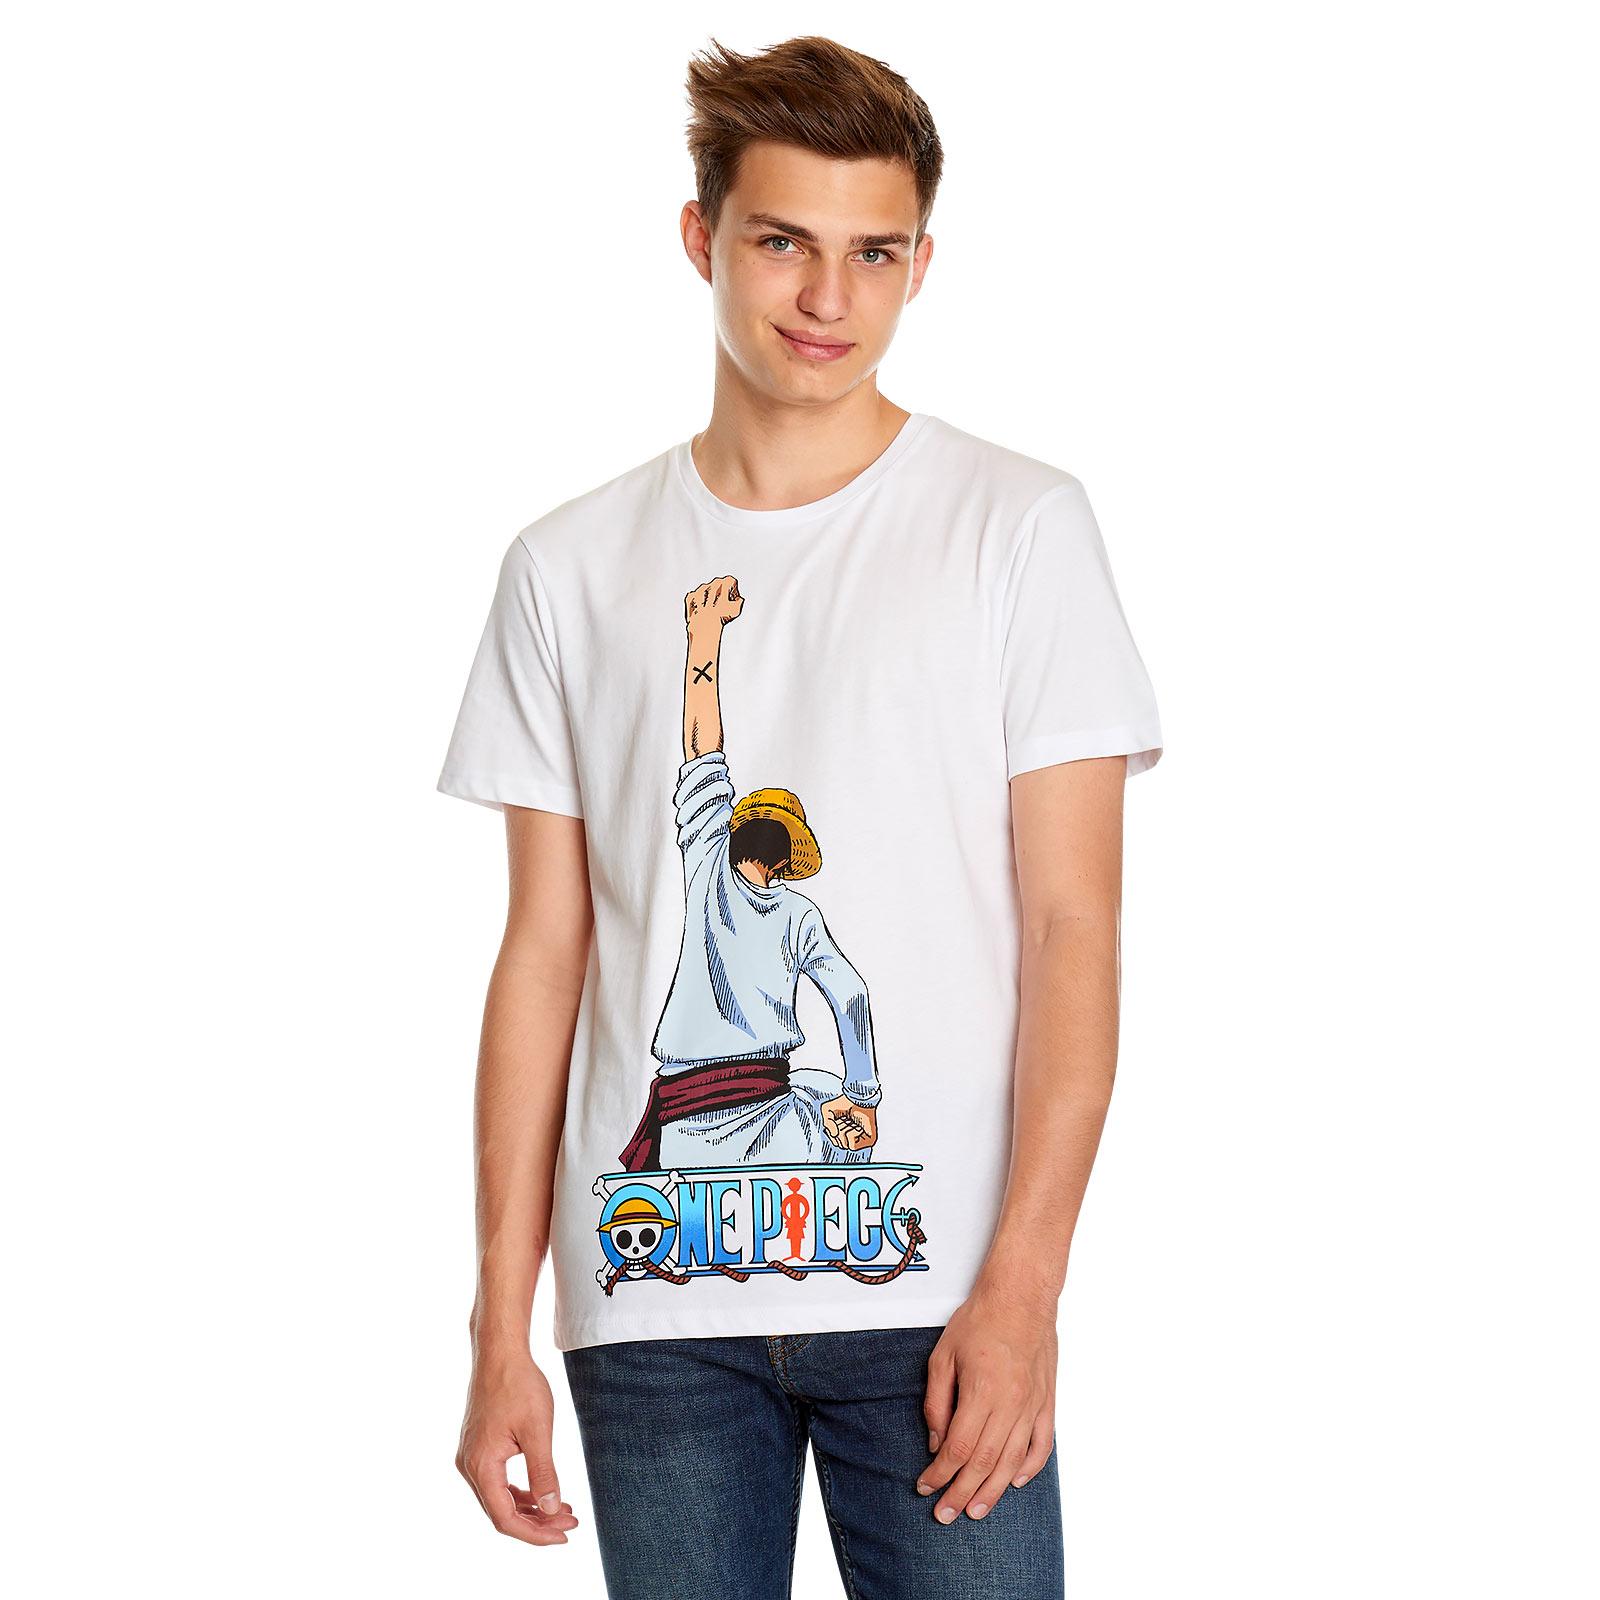 One Piece - Ruffy Fight Pose T-Shirt weiß